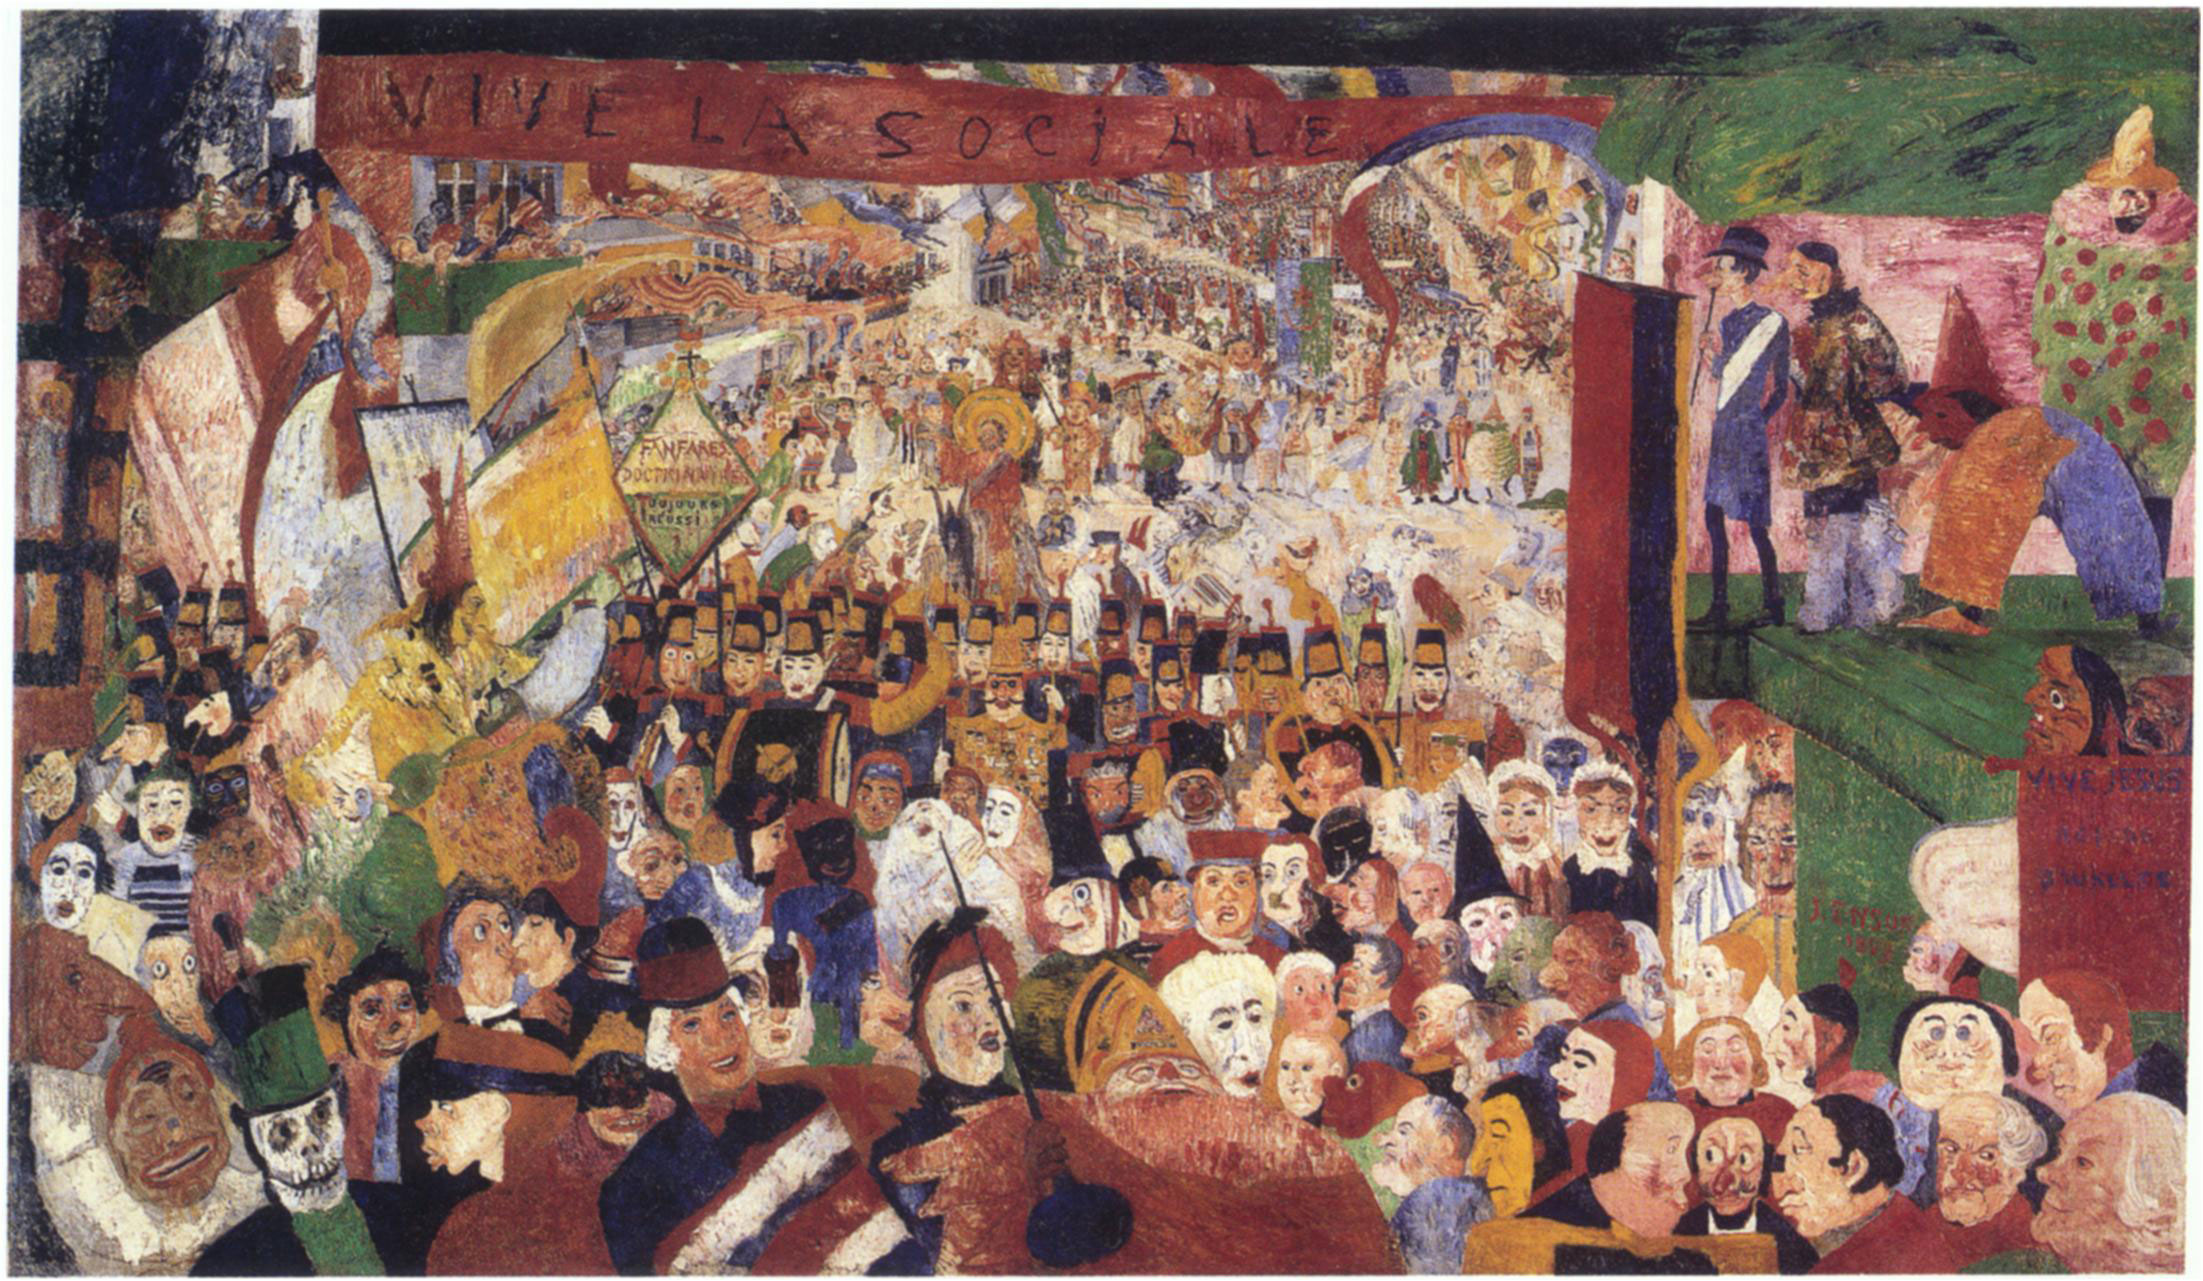 Relationship Between Graphic and Dada's Half-Century